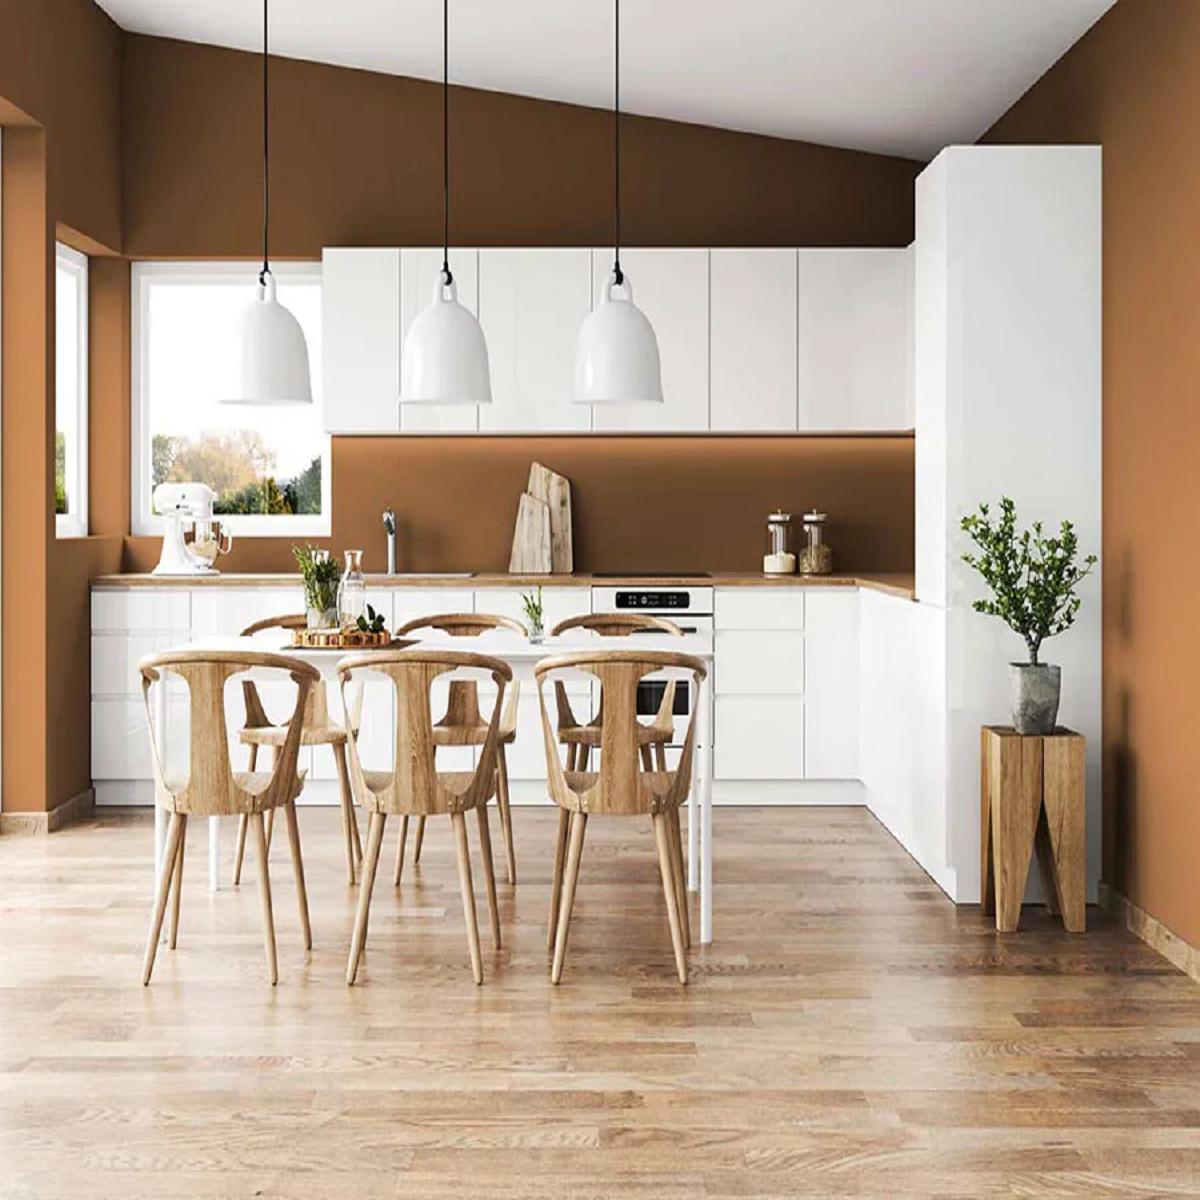 Pareti bronzo in cucina: 10 idee e foto